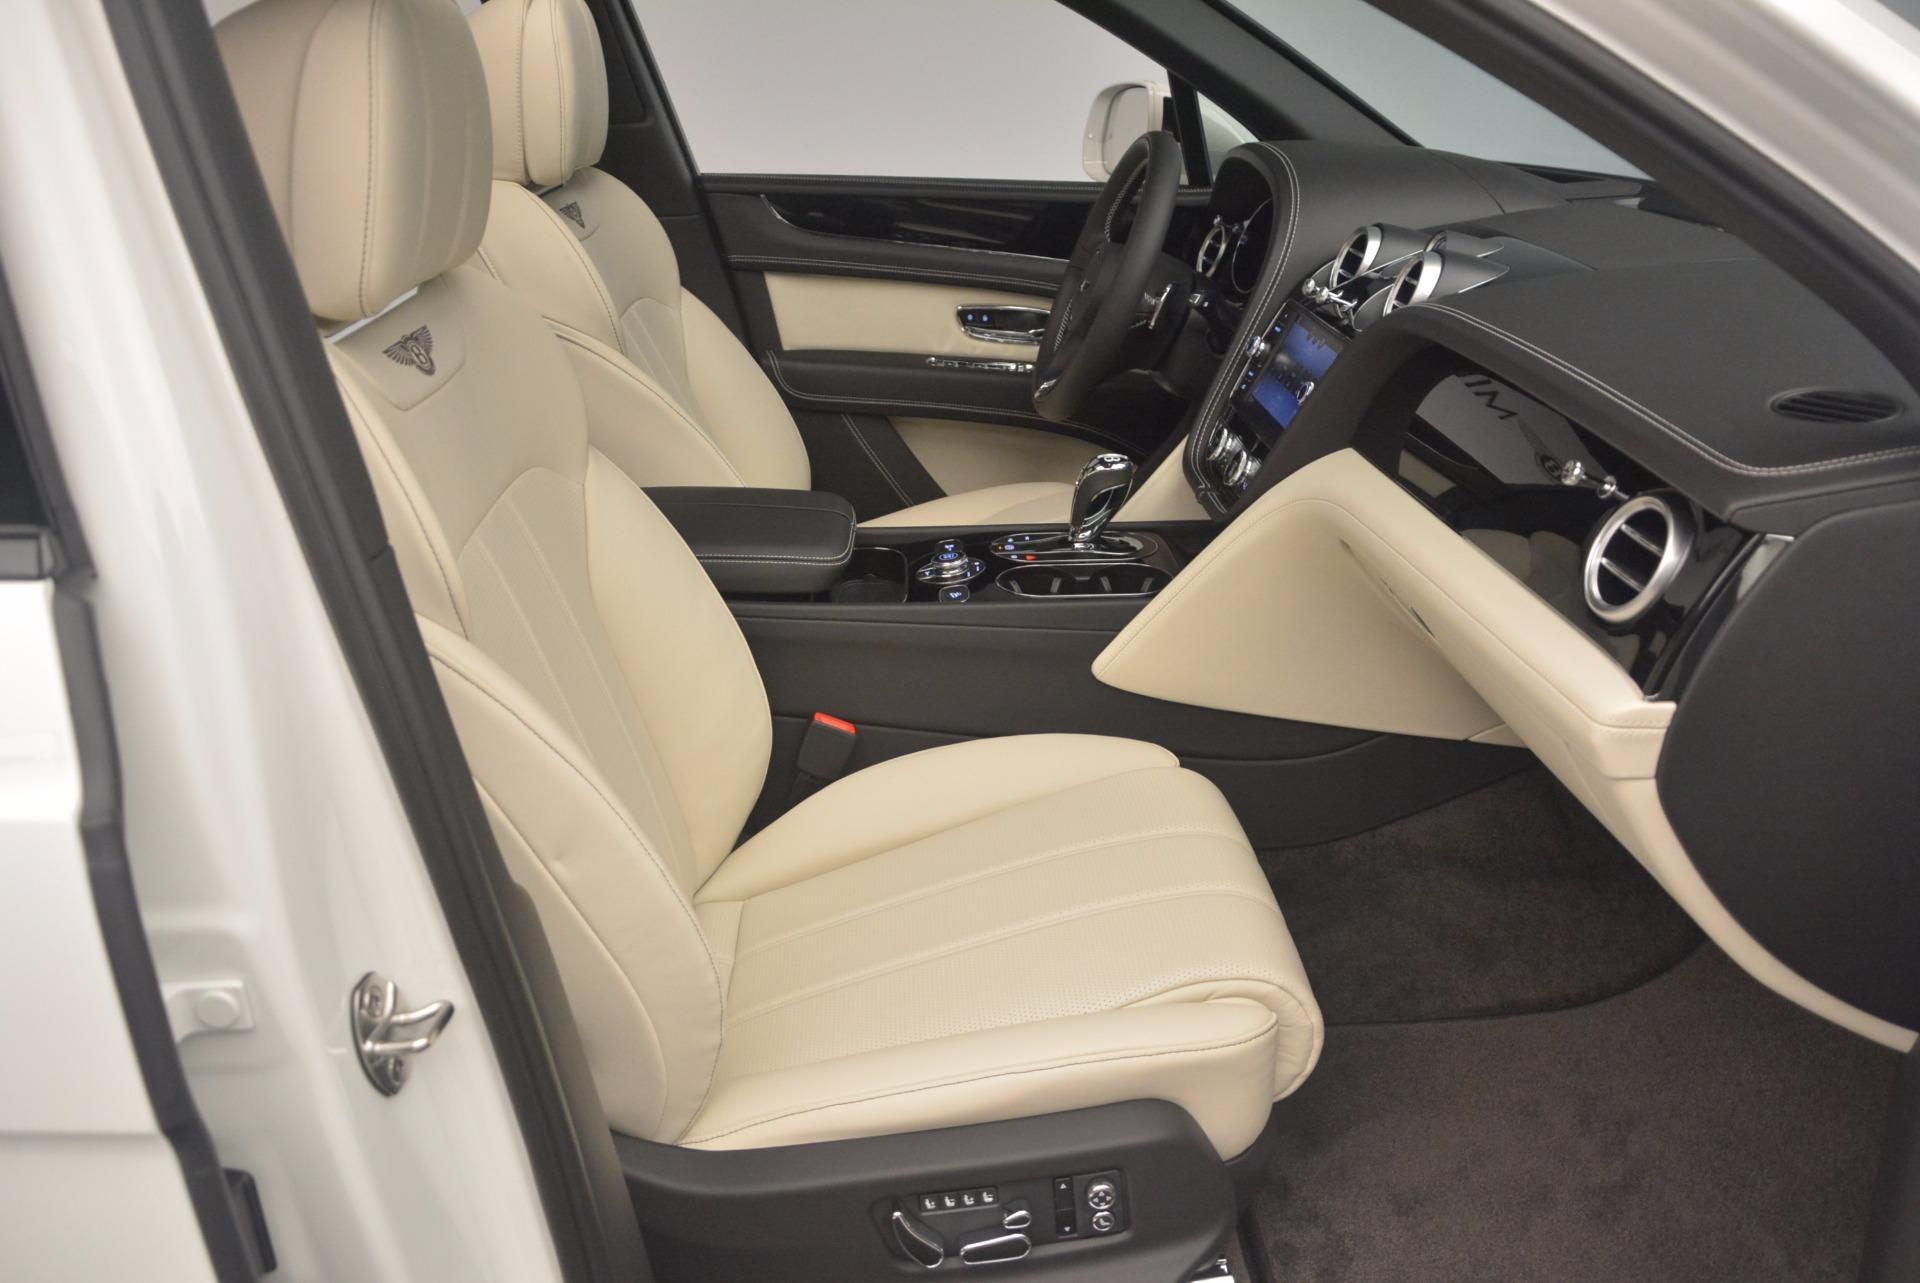 Used 2018 Bentley Bentayga Onyx For Sale In Greenwich, CT. Alfa Romeo of Greenwich, 7485 1549_p28